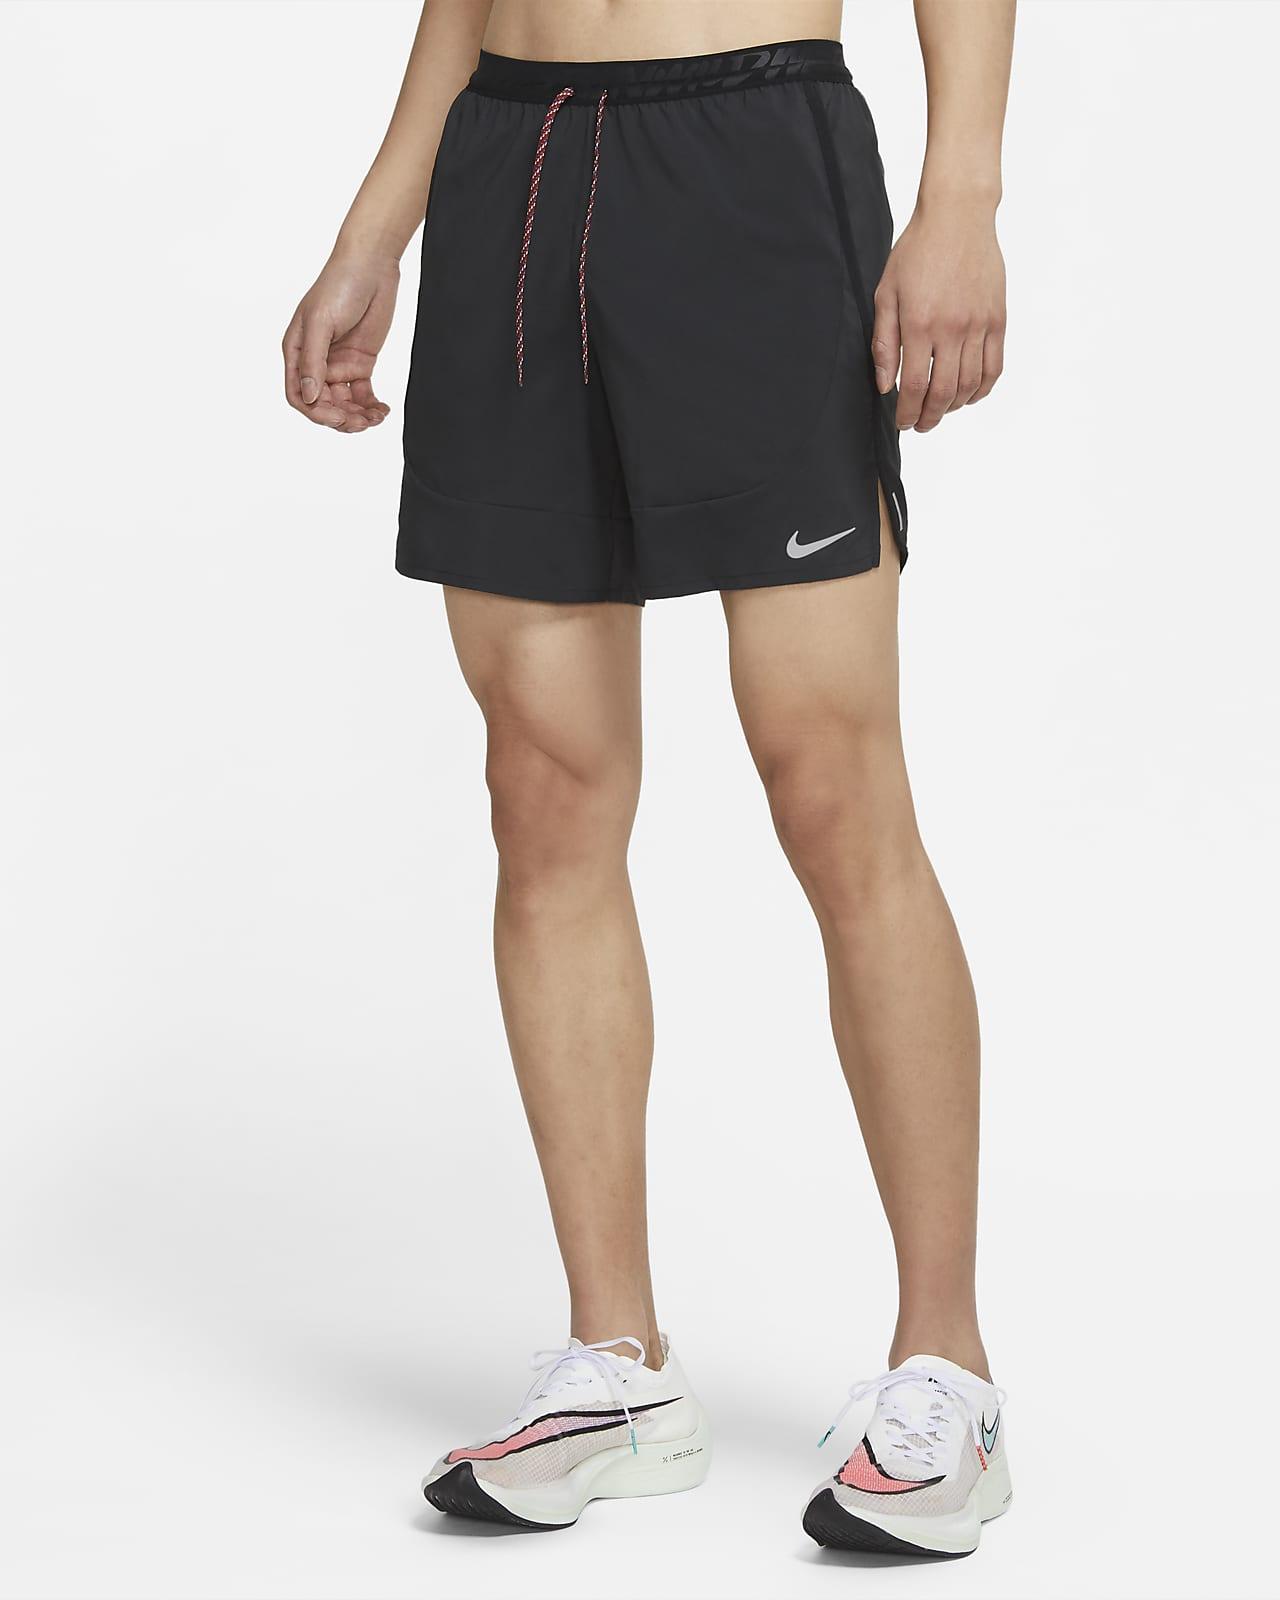 Nike Flex Stride Wild Run 男款無襯裡跑步短褲